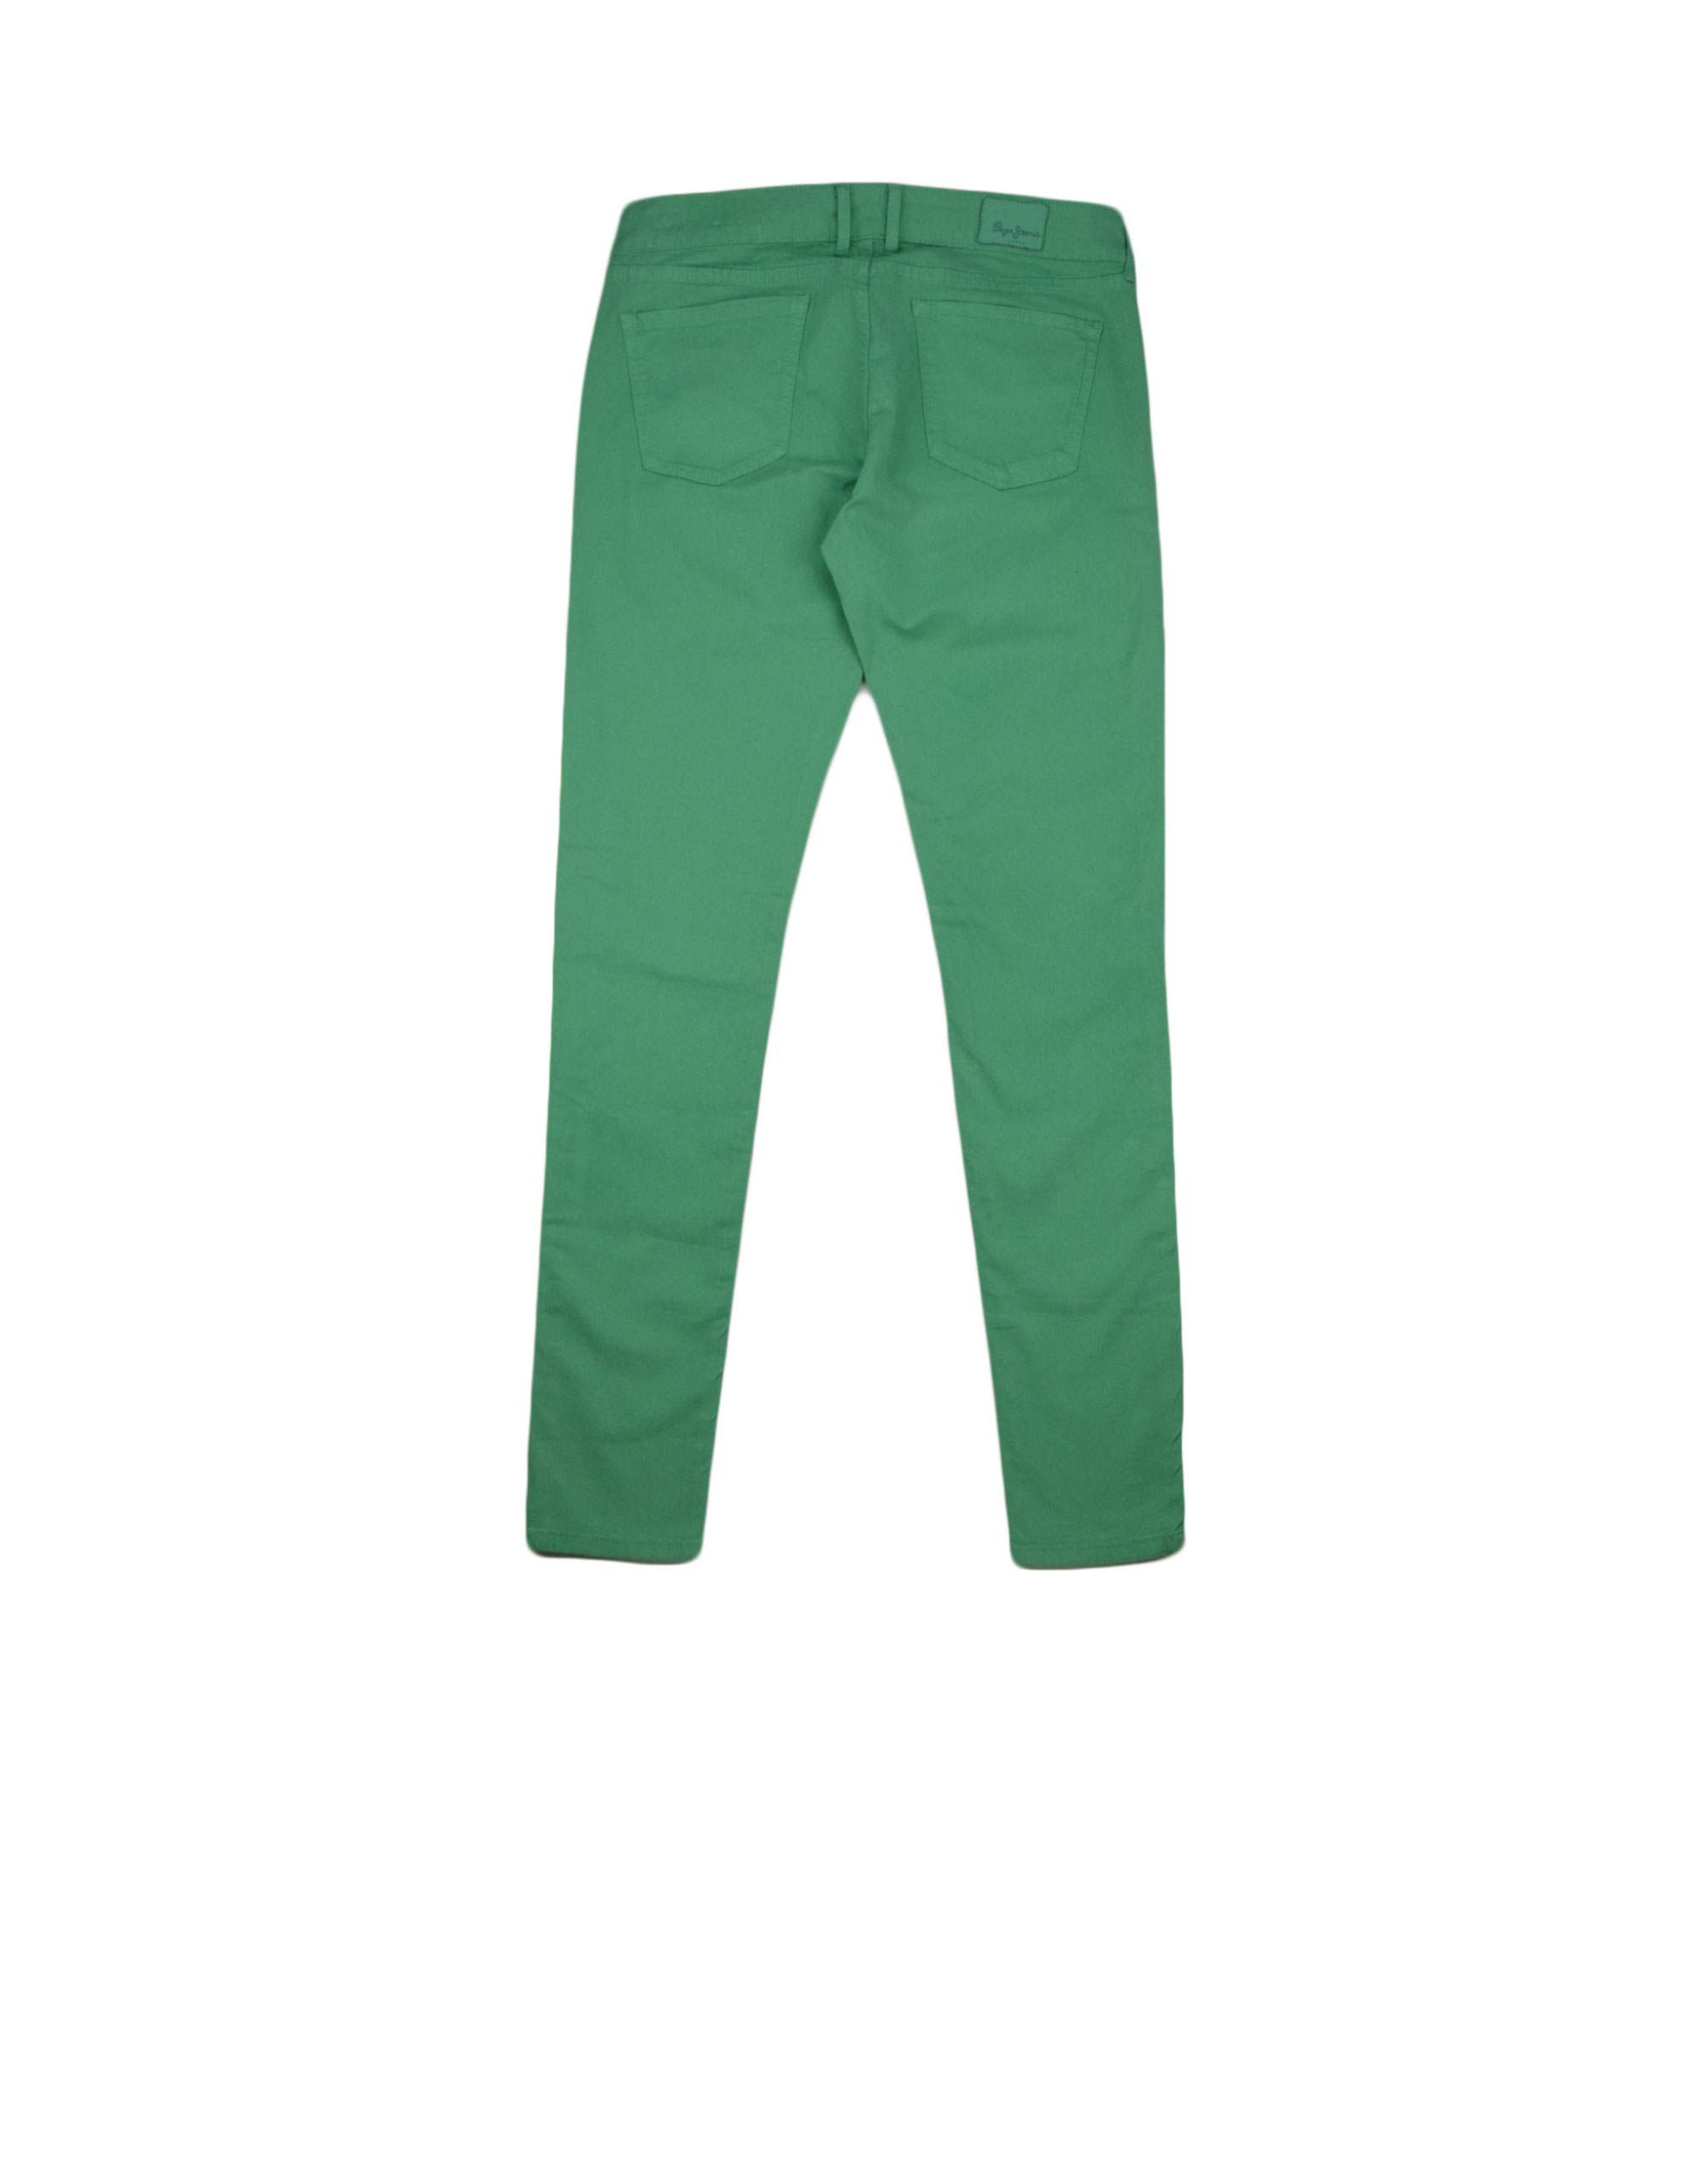 Pepe Jeans (PL210548U042) Green